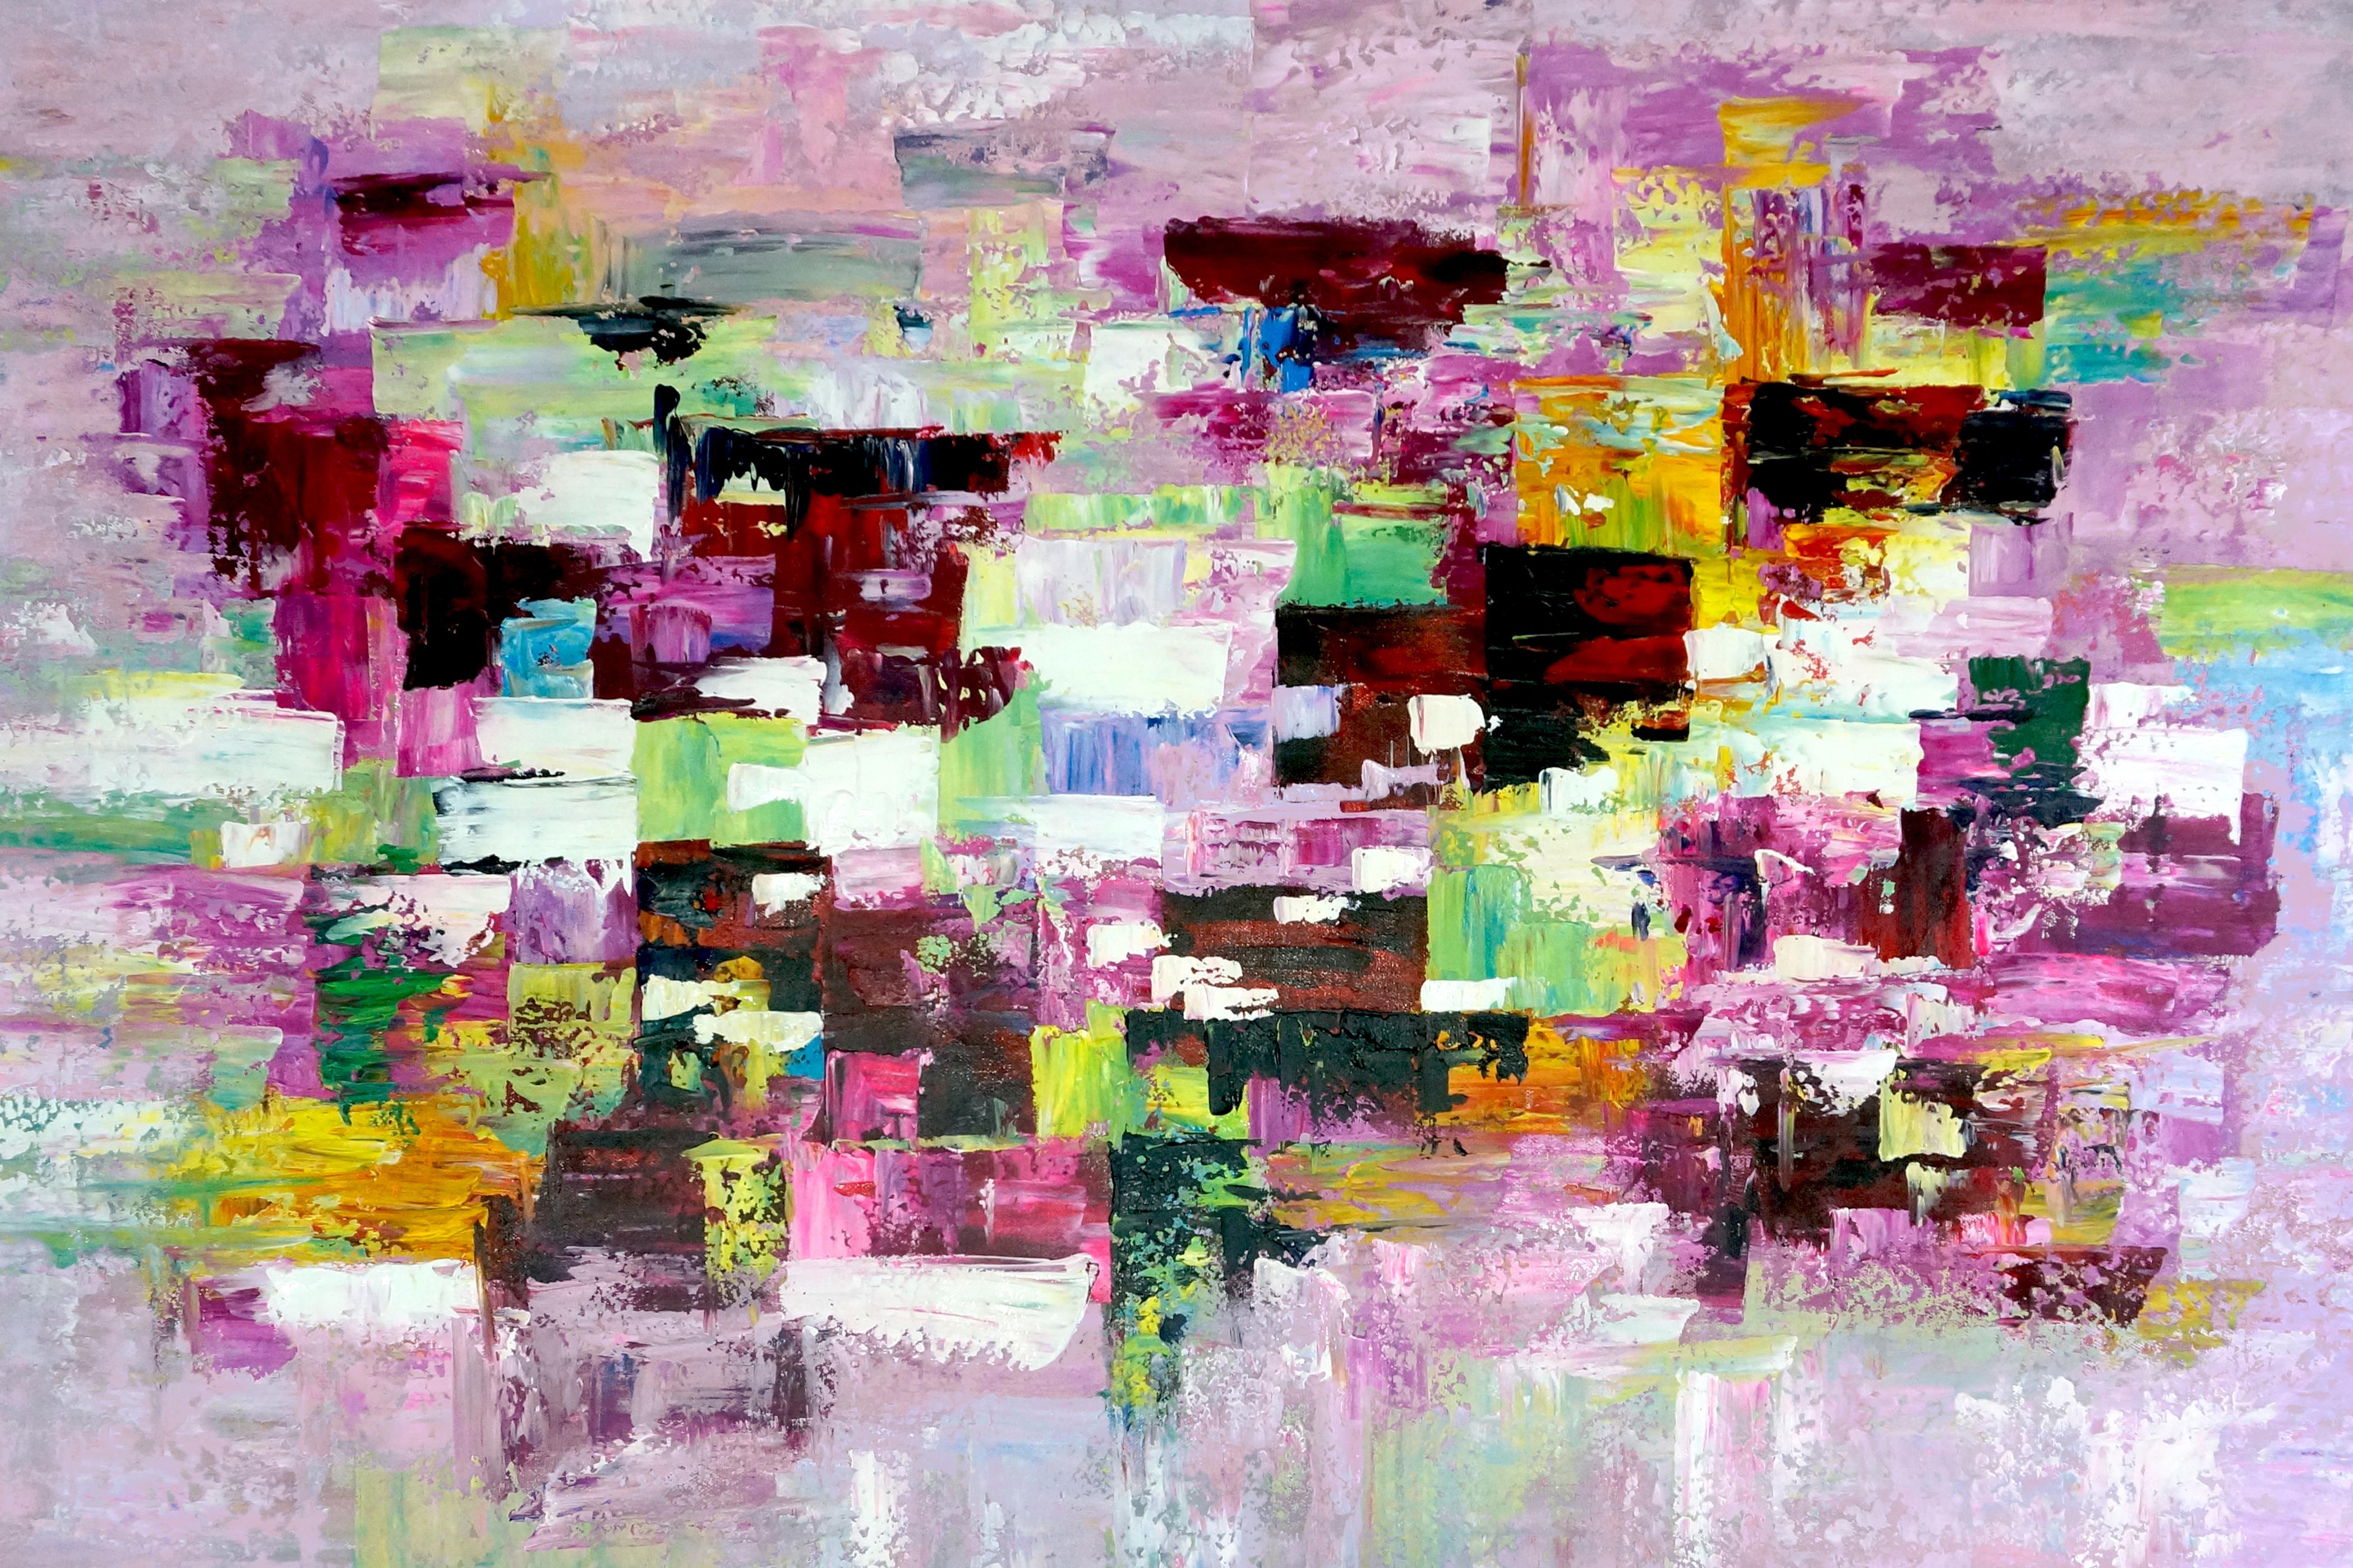 36378Cityscape kunstwerk abstract schilderij EA-FG45